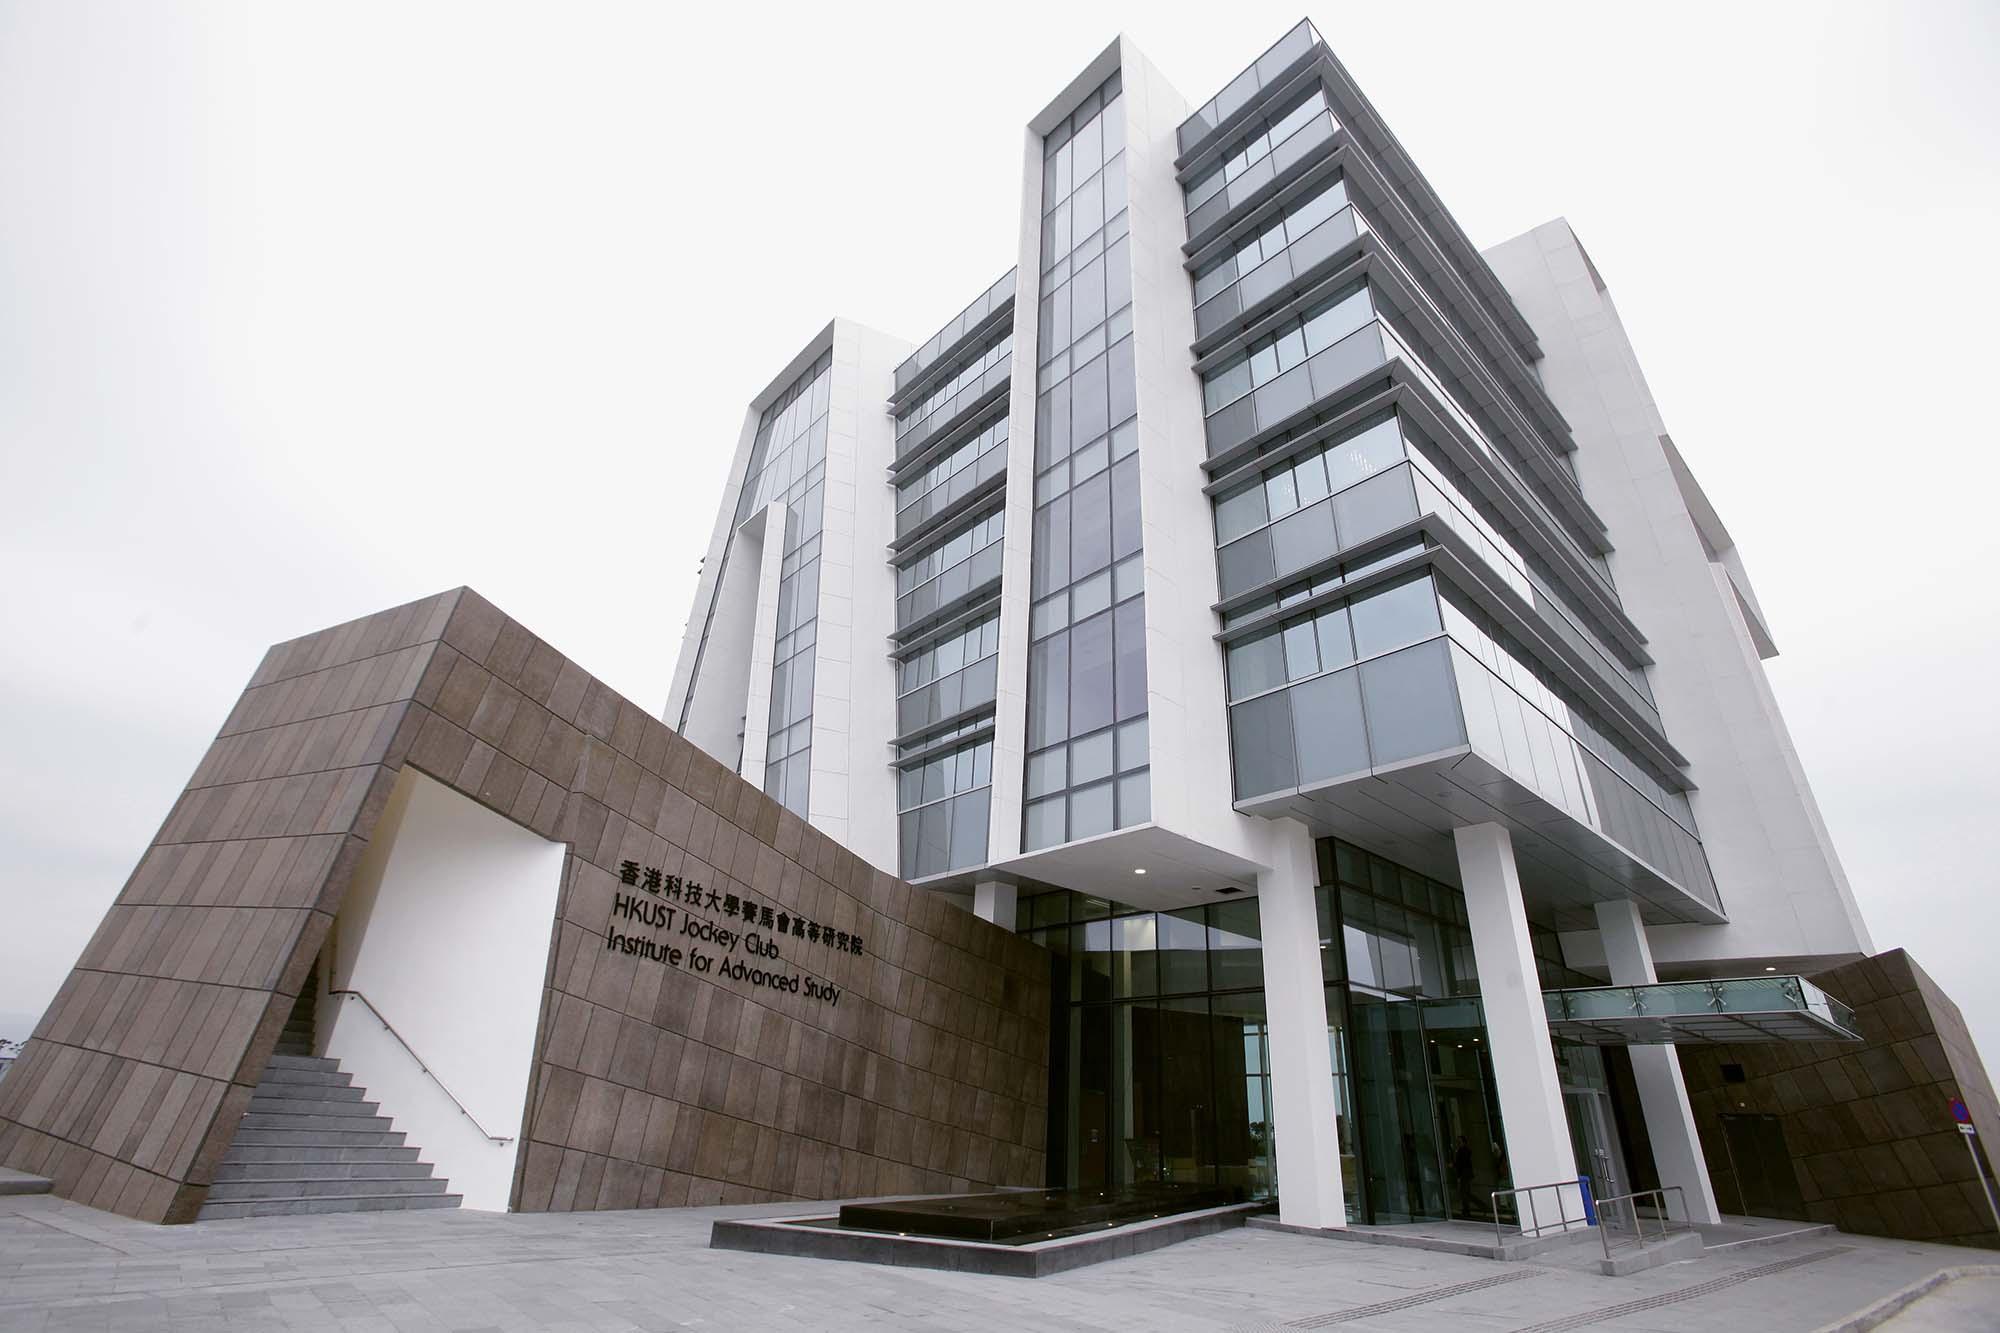 HKUST 香港科技大學 – 亞洲全英語授課的頂尖學府之一